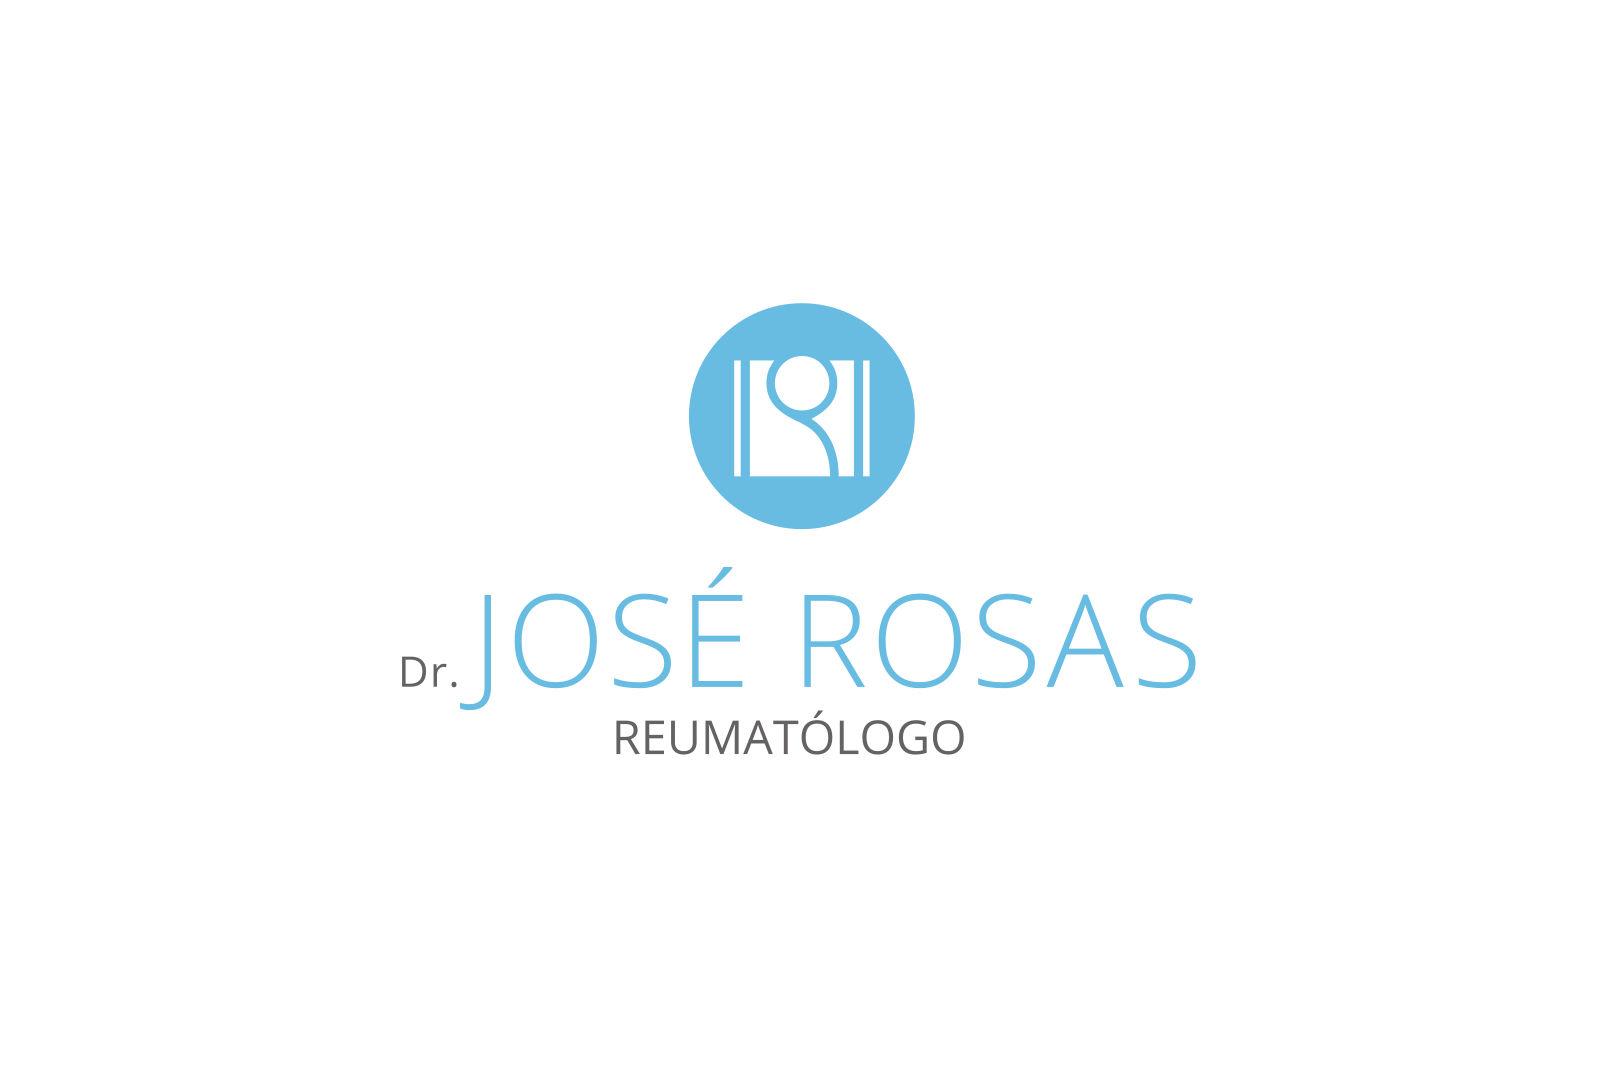 José Rosas Reumatólogo